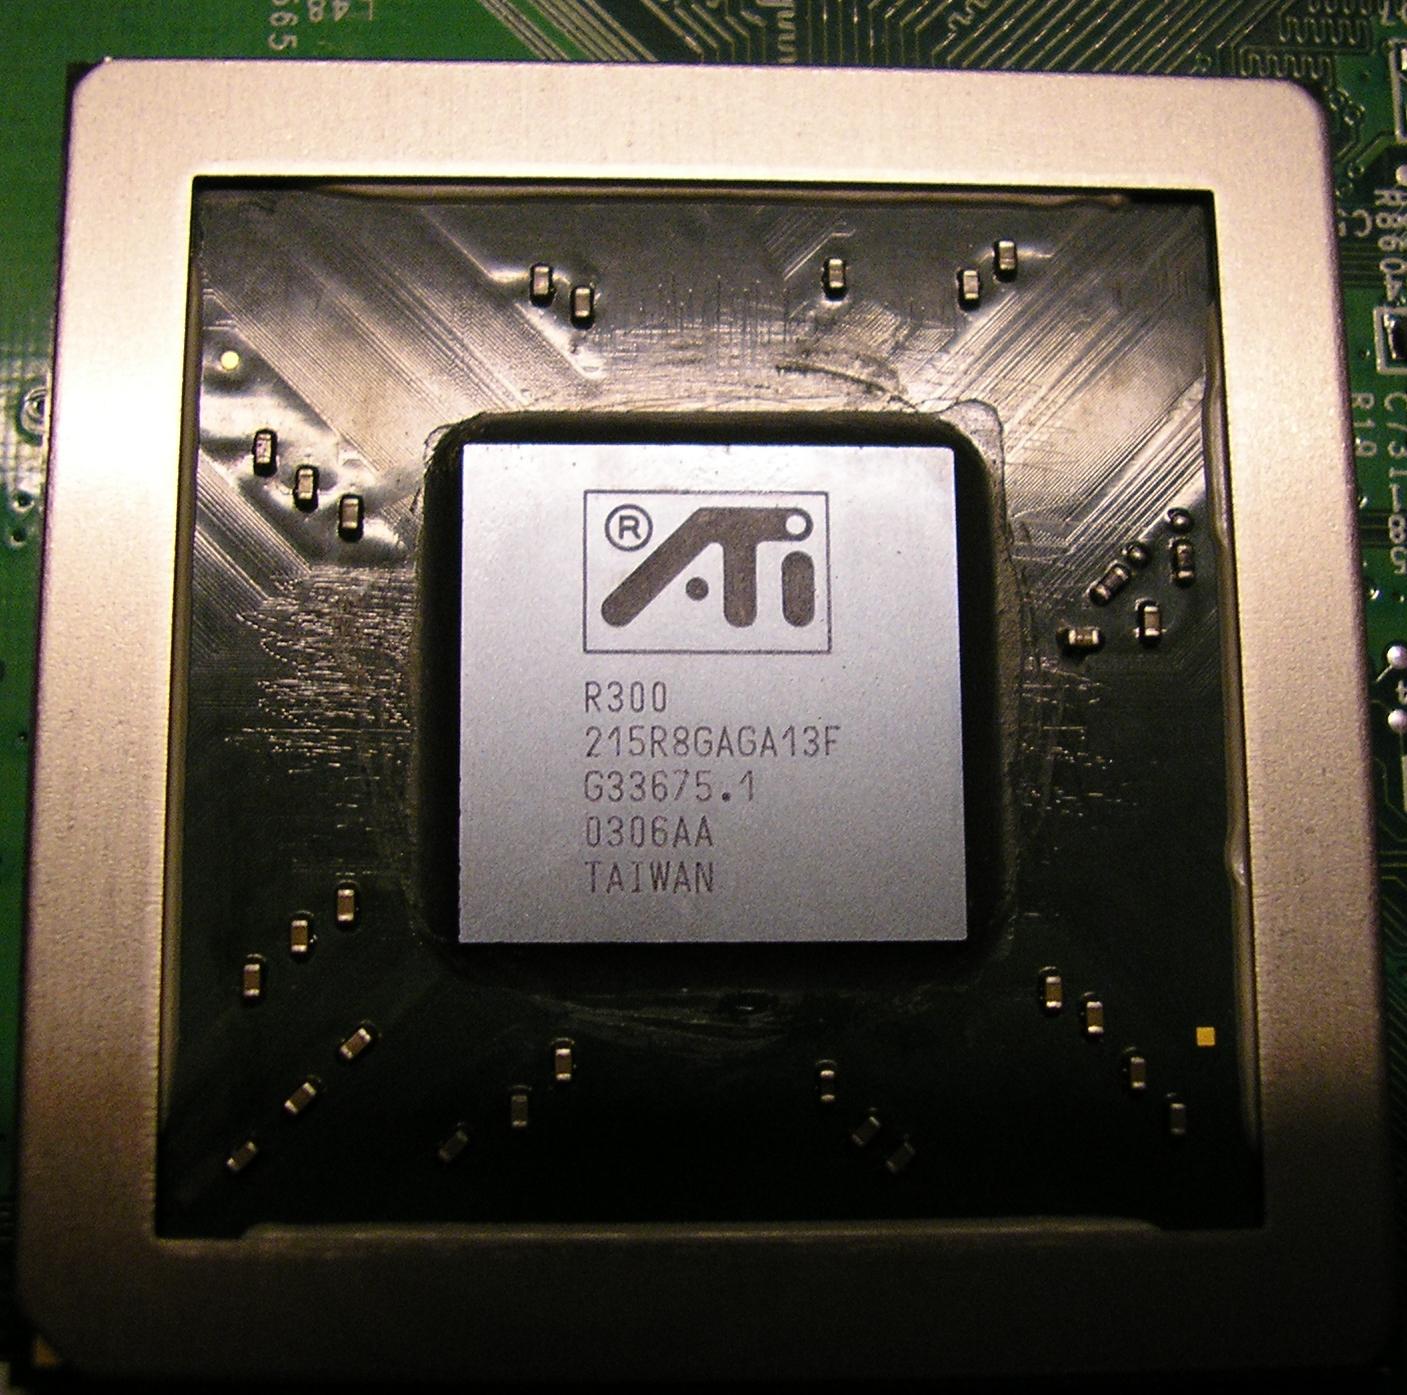 Ati Radeon 9700 Mobility M11 Driver